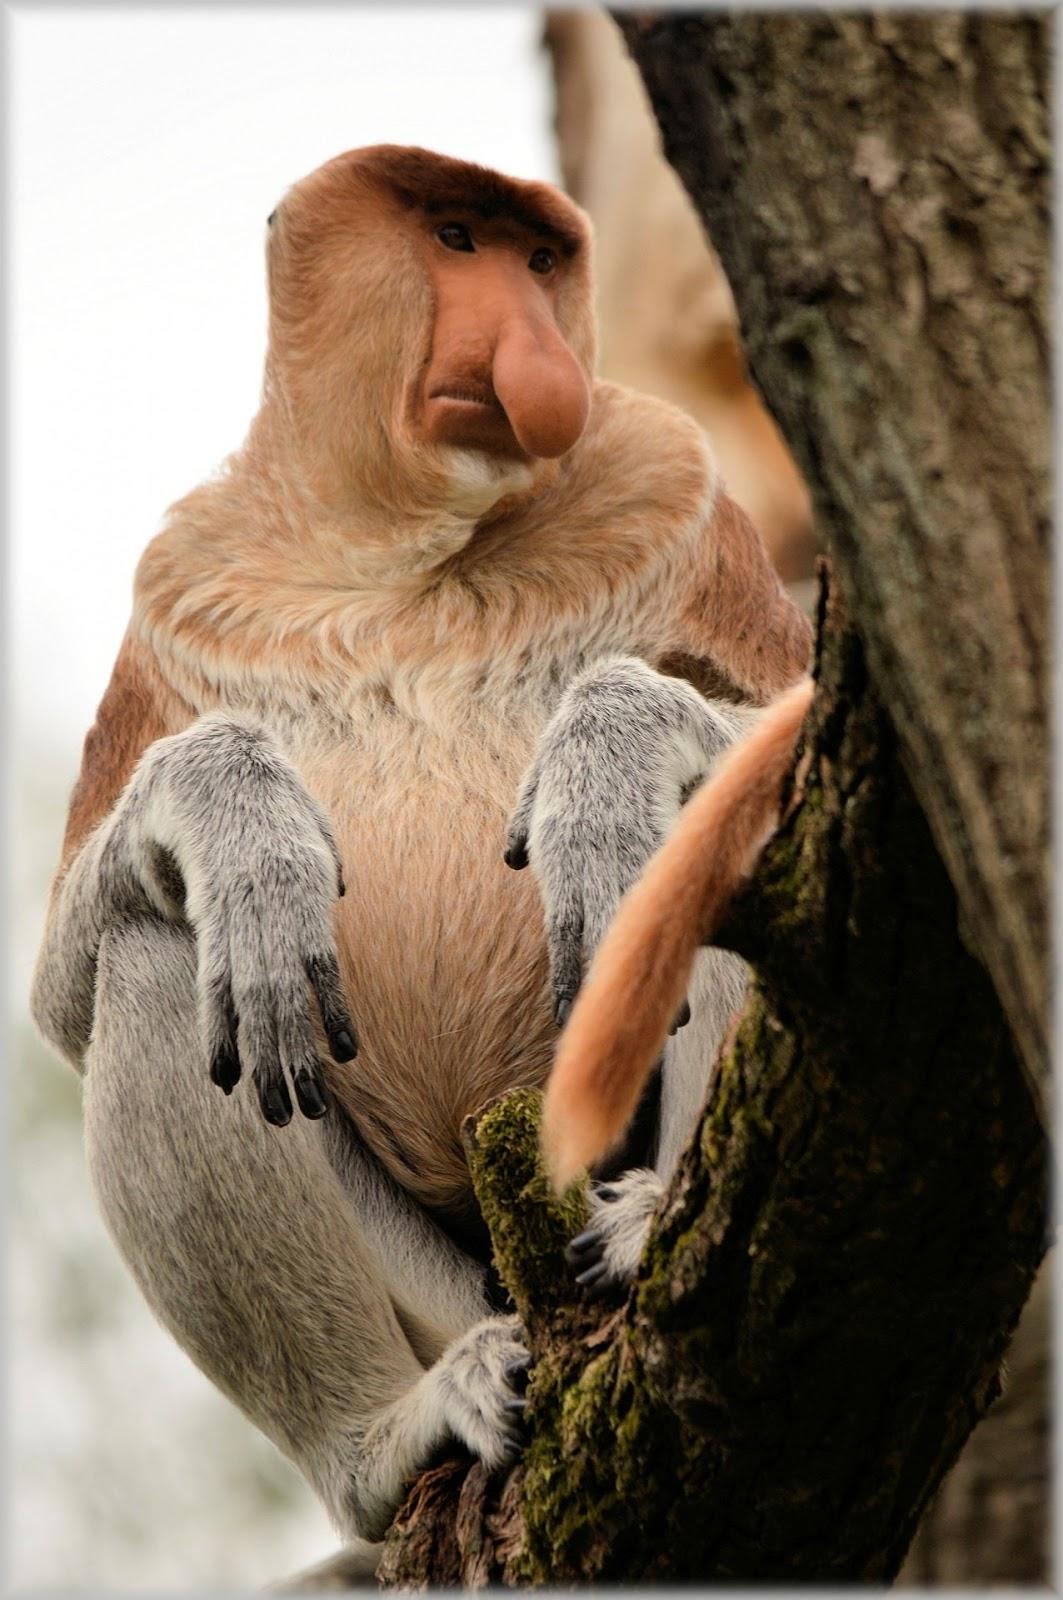 Image of a proboscis monkey.